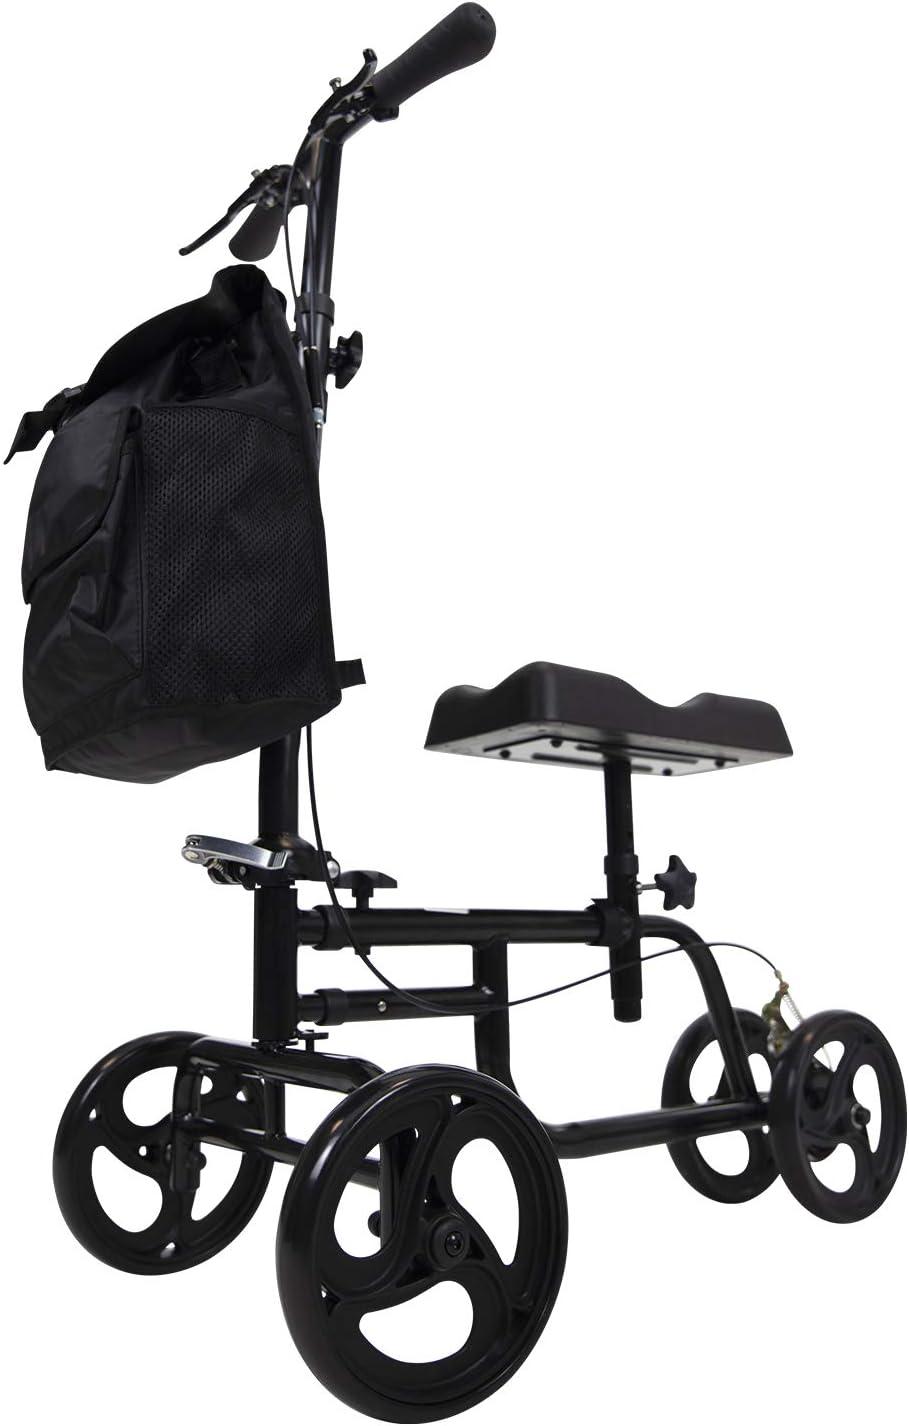 Vive Mobility Knee Walker - Steerable Broken 送料無料激安祭 Fo 数量限定 for Leg Scooter